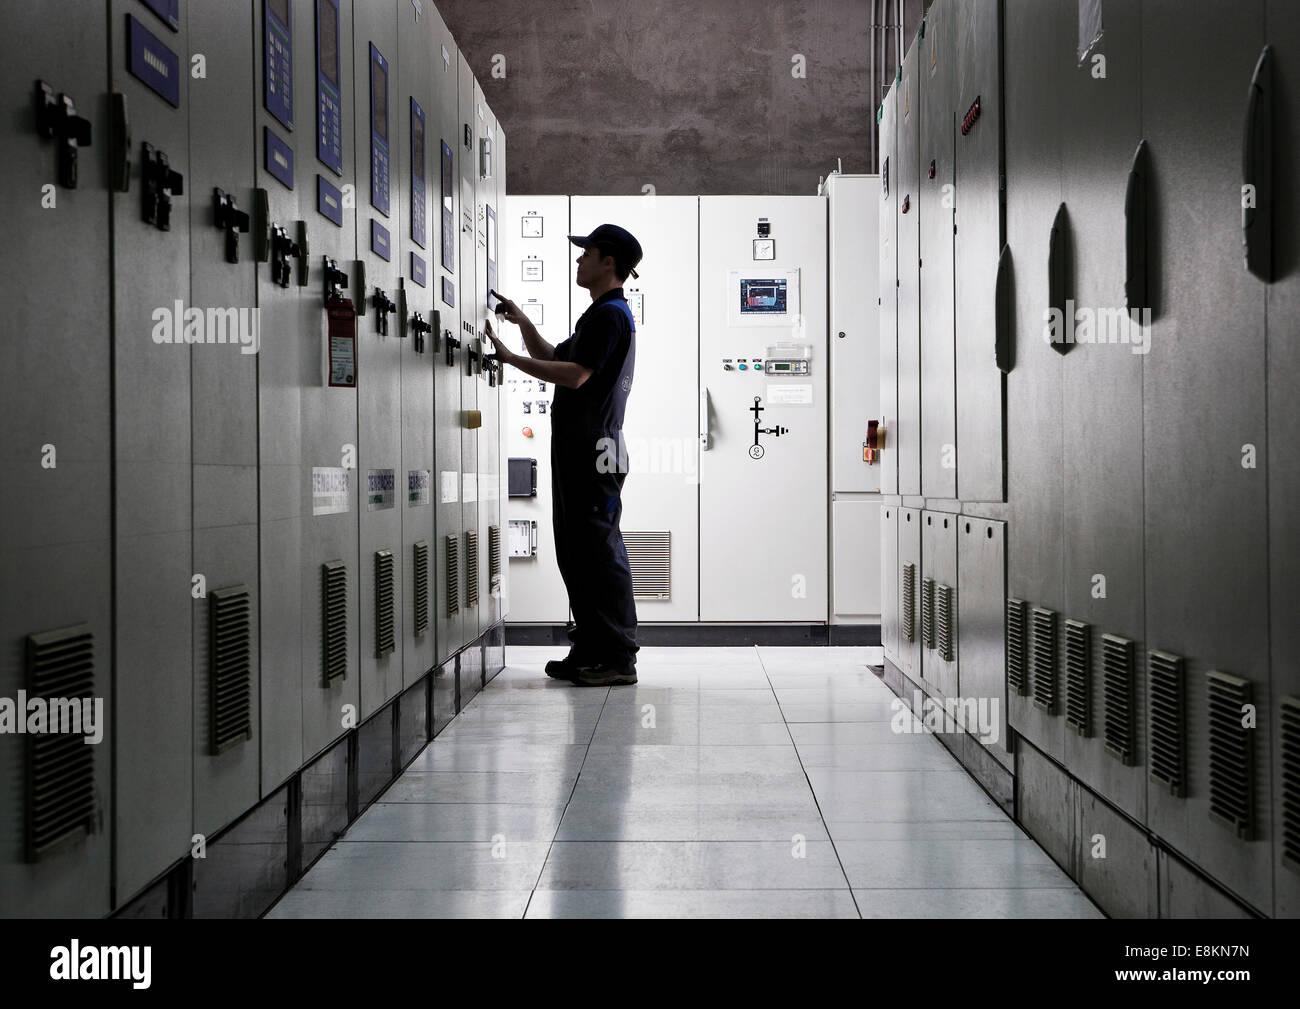 Tecnici di distribuzione elettrica camera, Landfrischmolkerei latteria, Wels, Austria superiore, Austria Immagini Stock